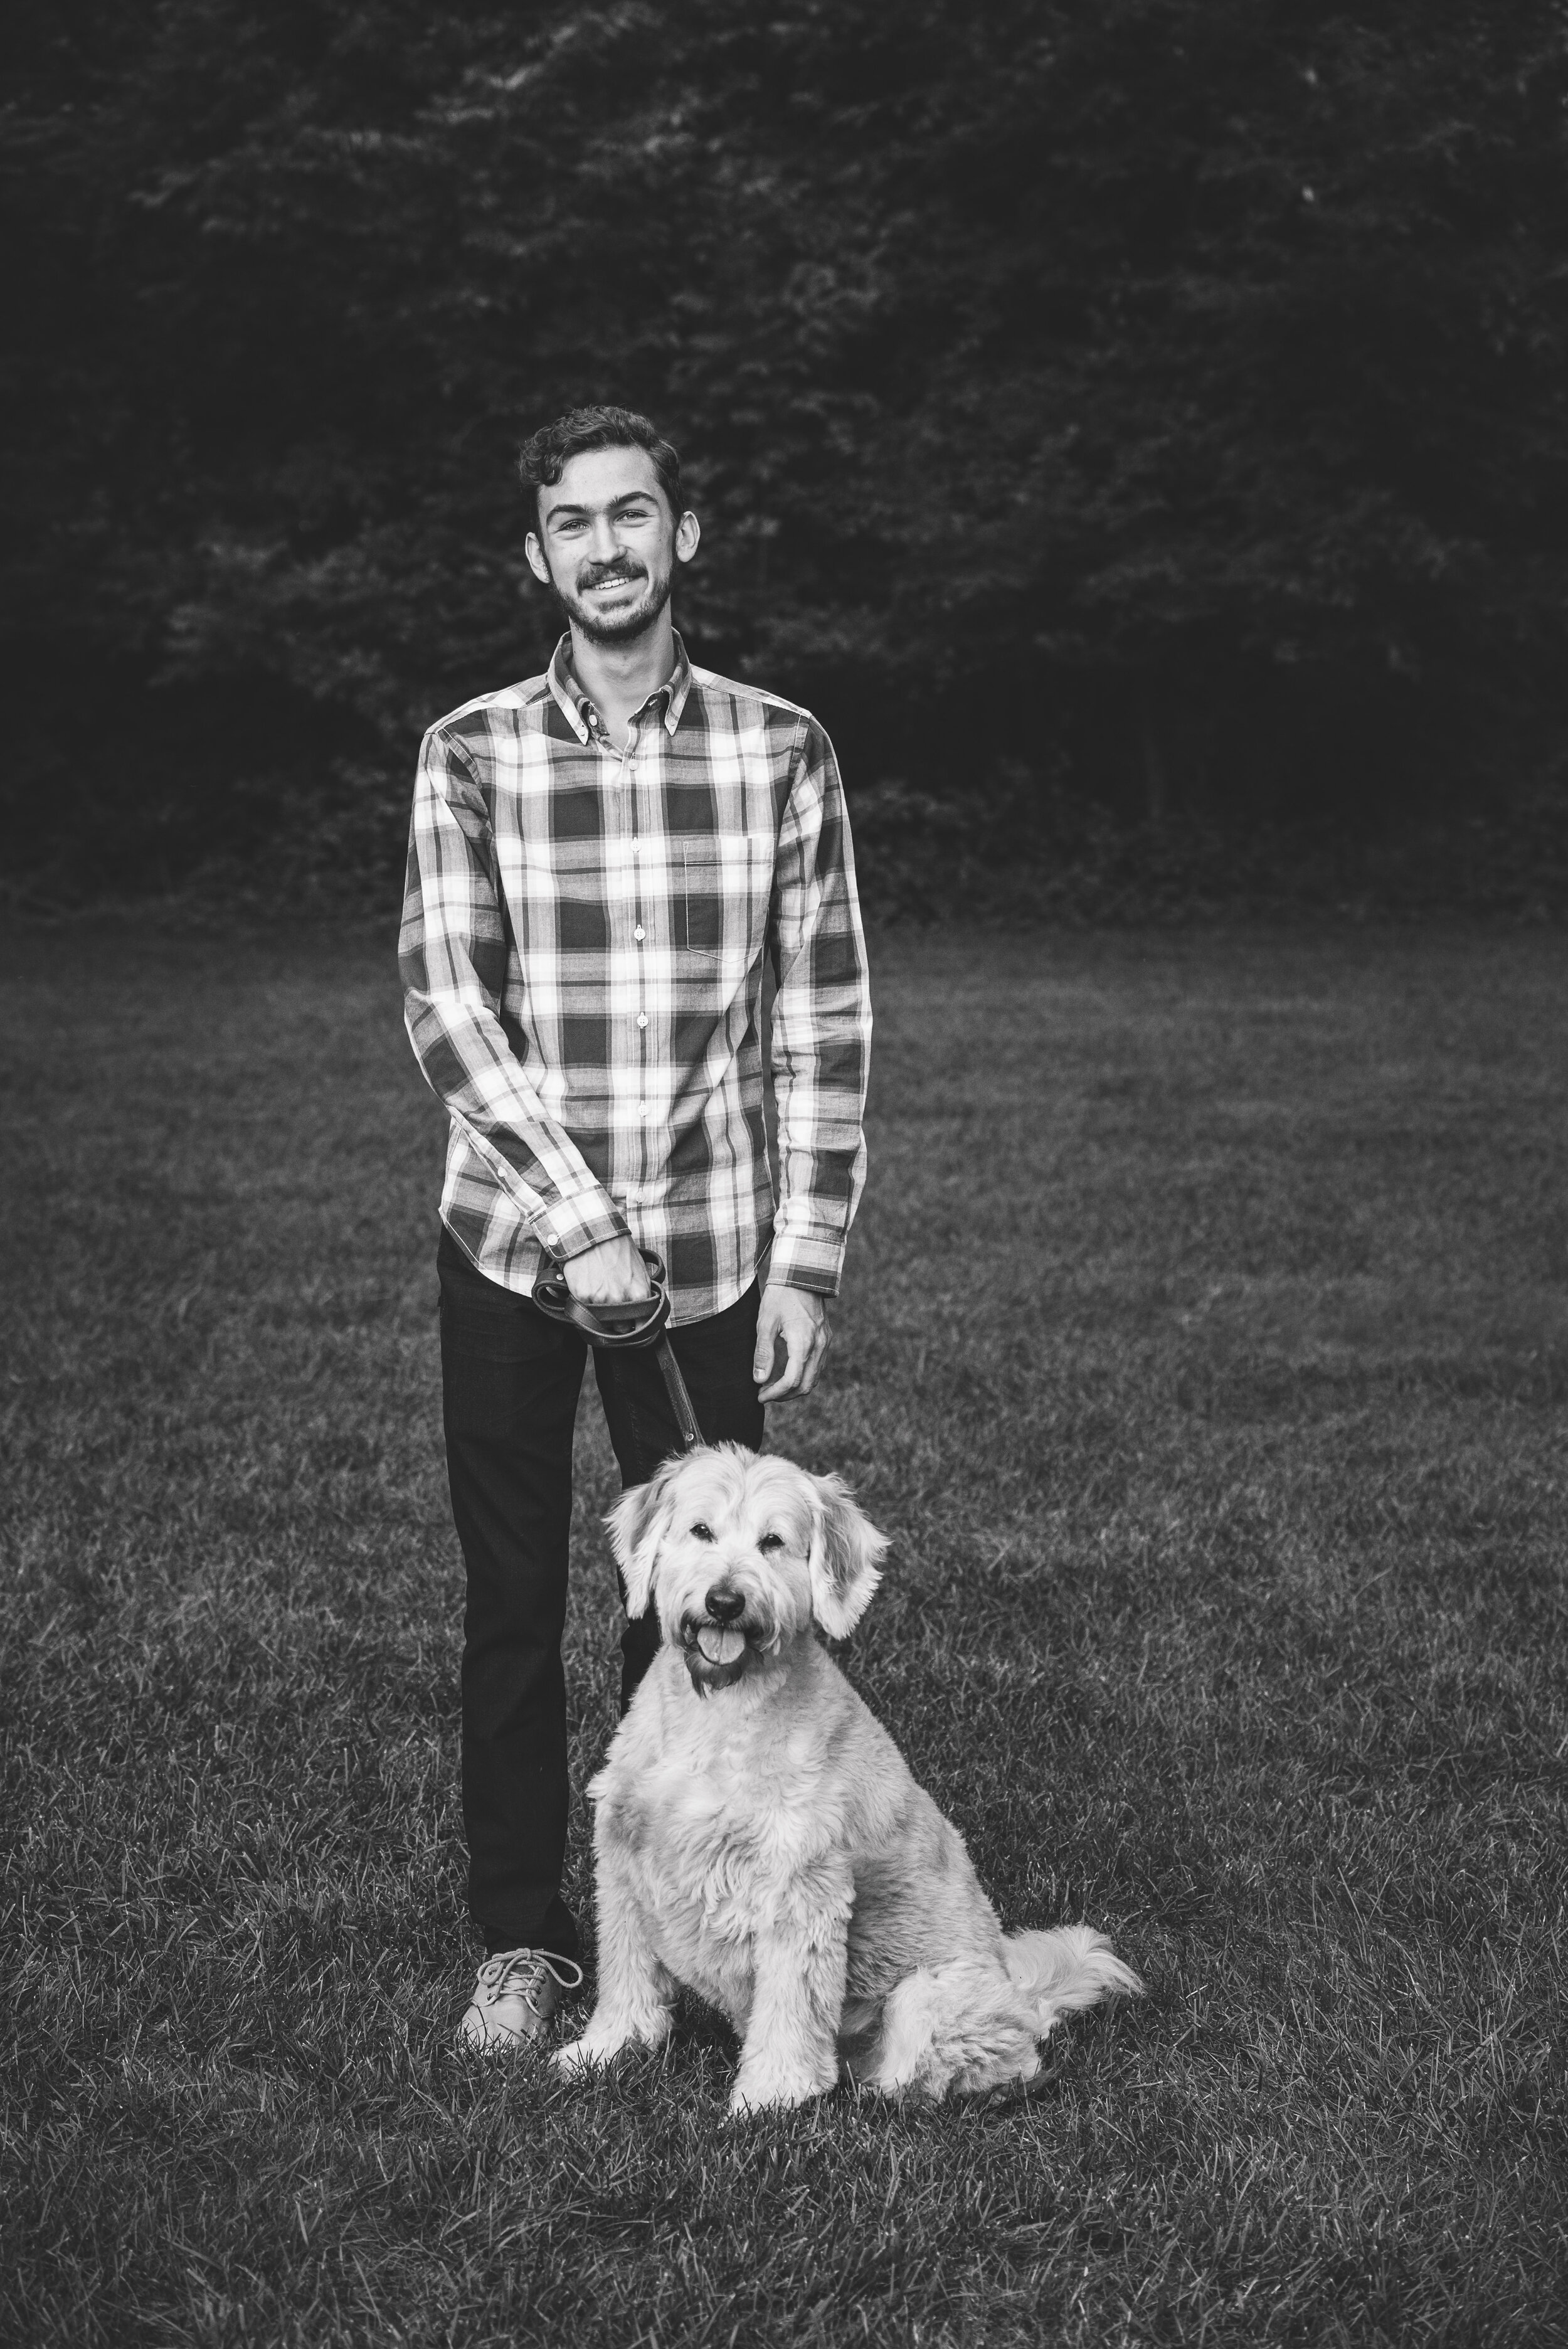 sylvania ohio senior photography with pet